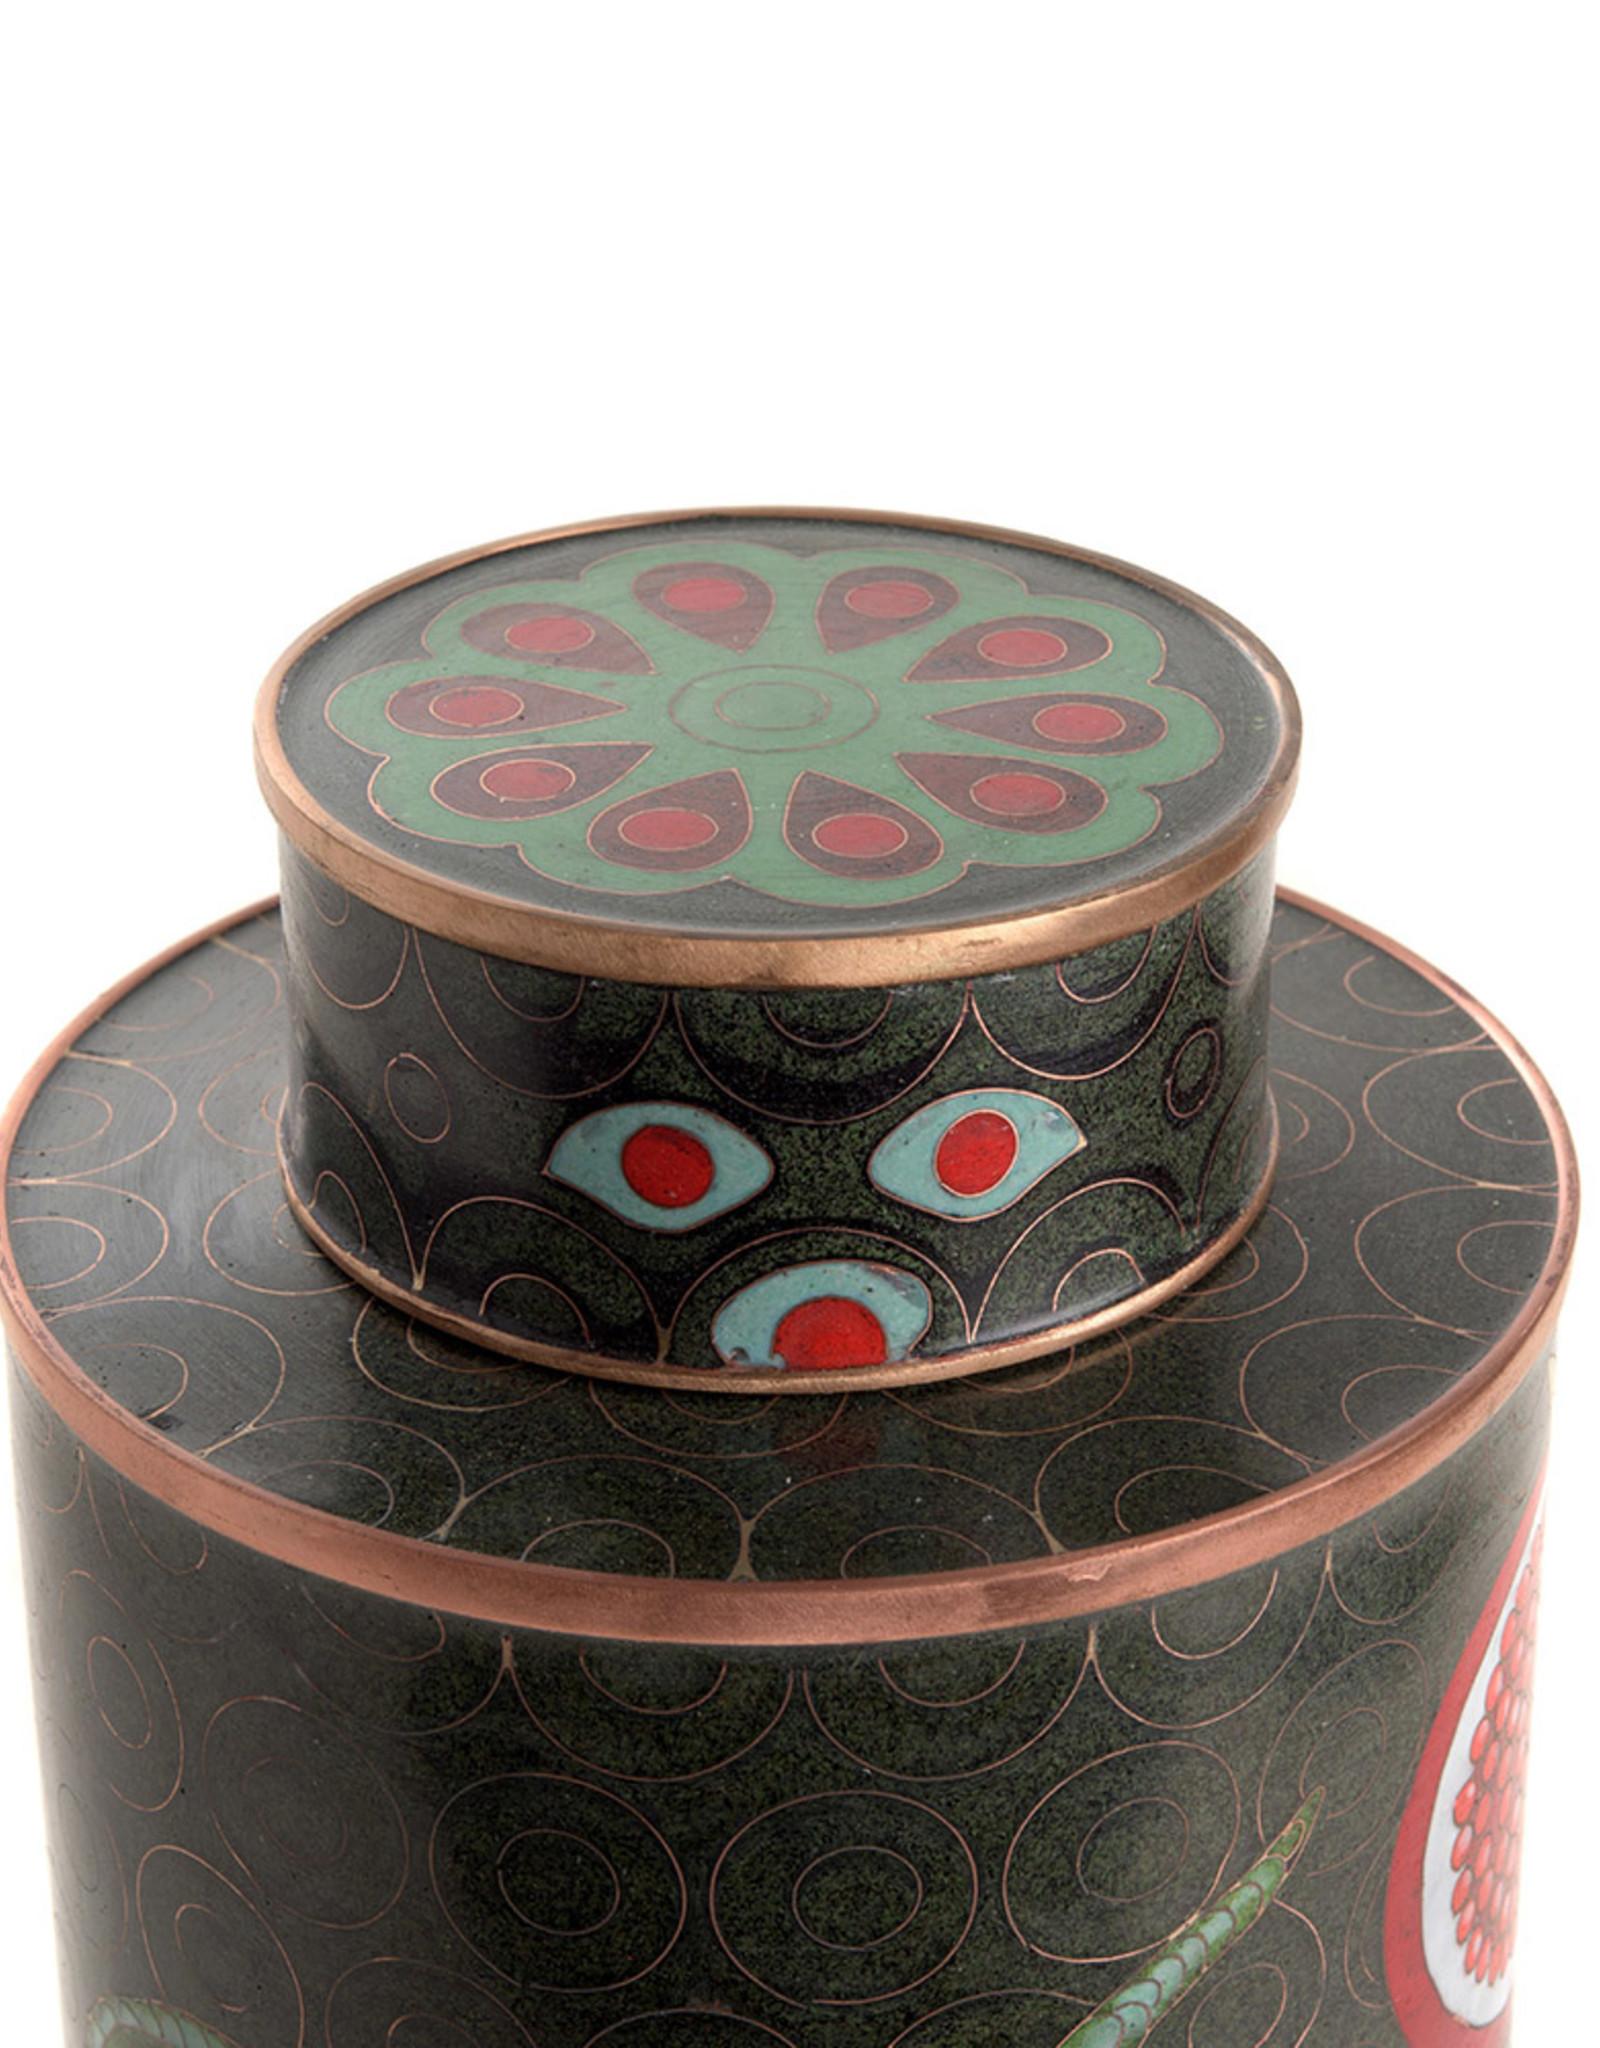 Fabienne Jouvin Cloisonné enameled tea box, snakes pommegranate, tall